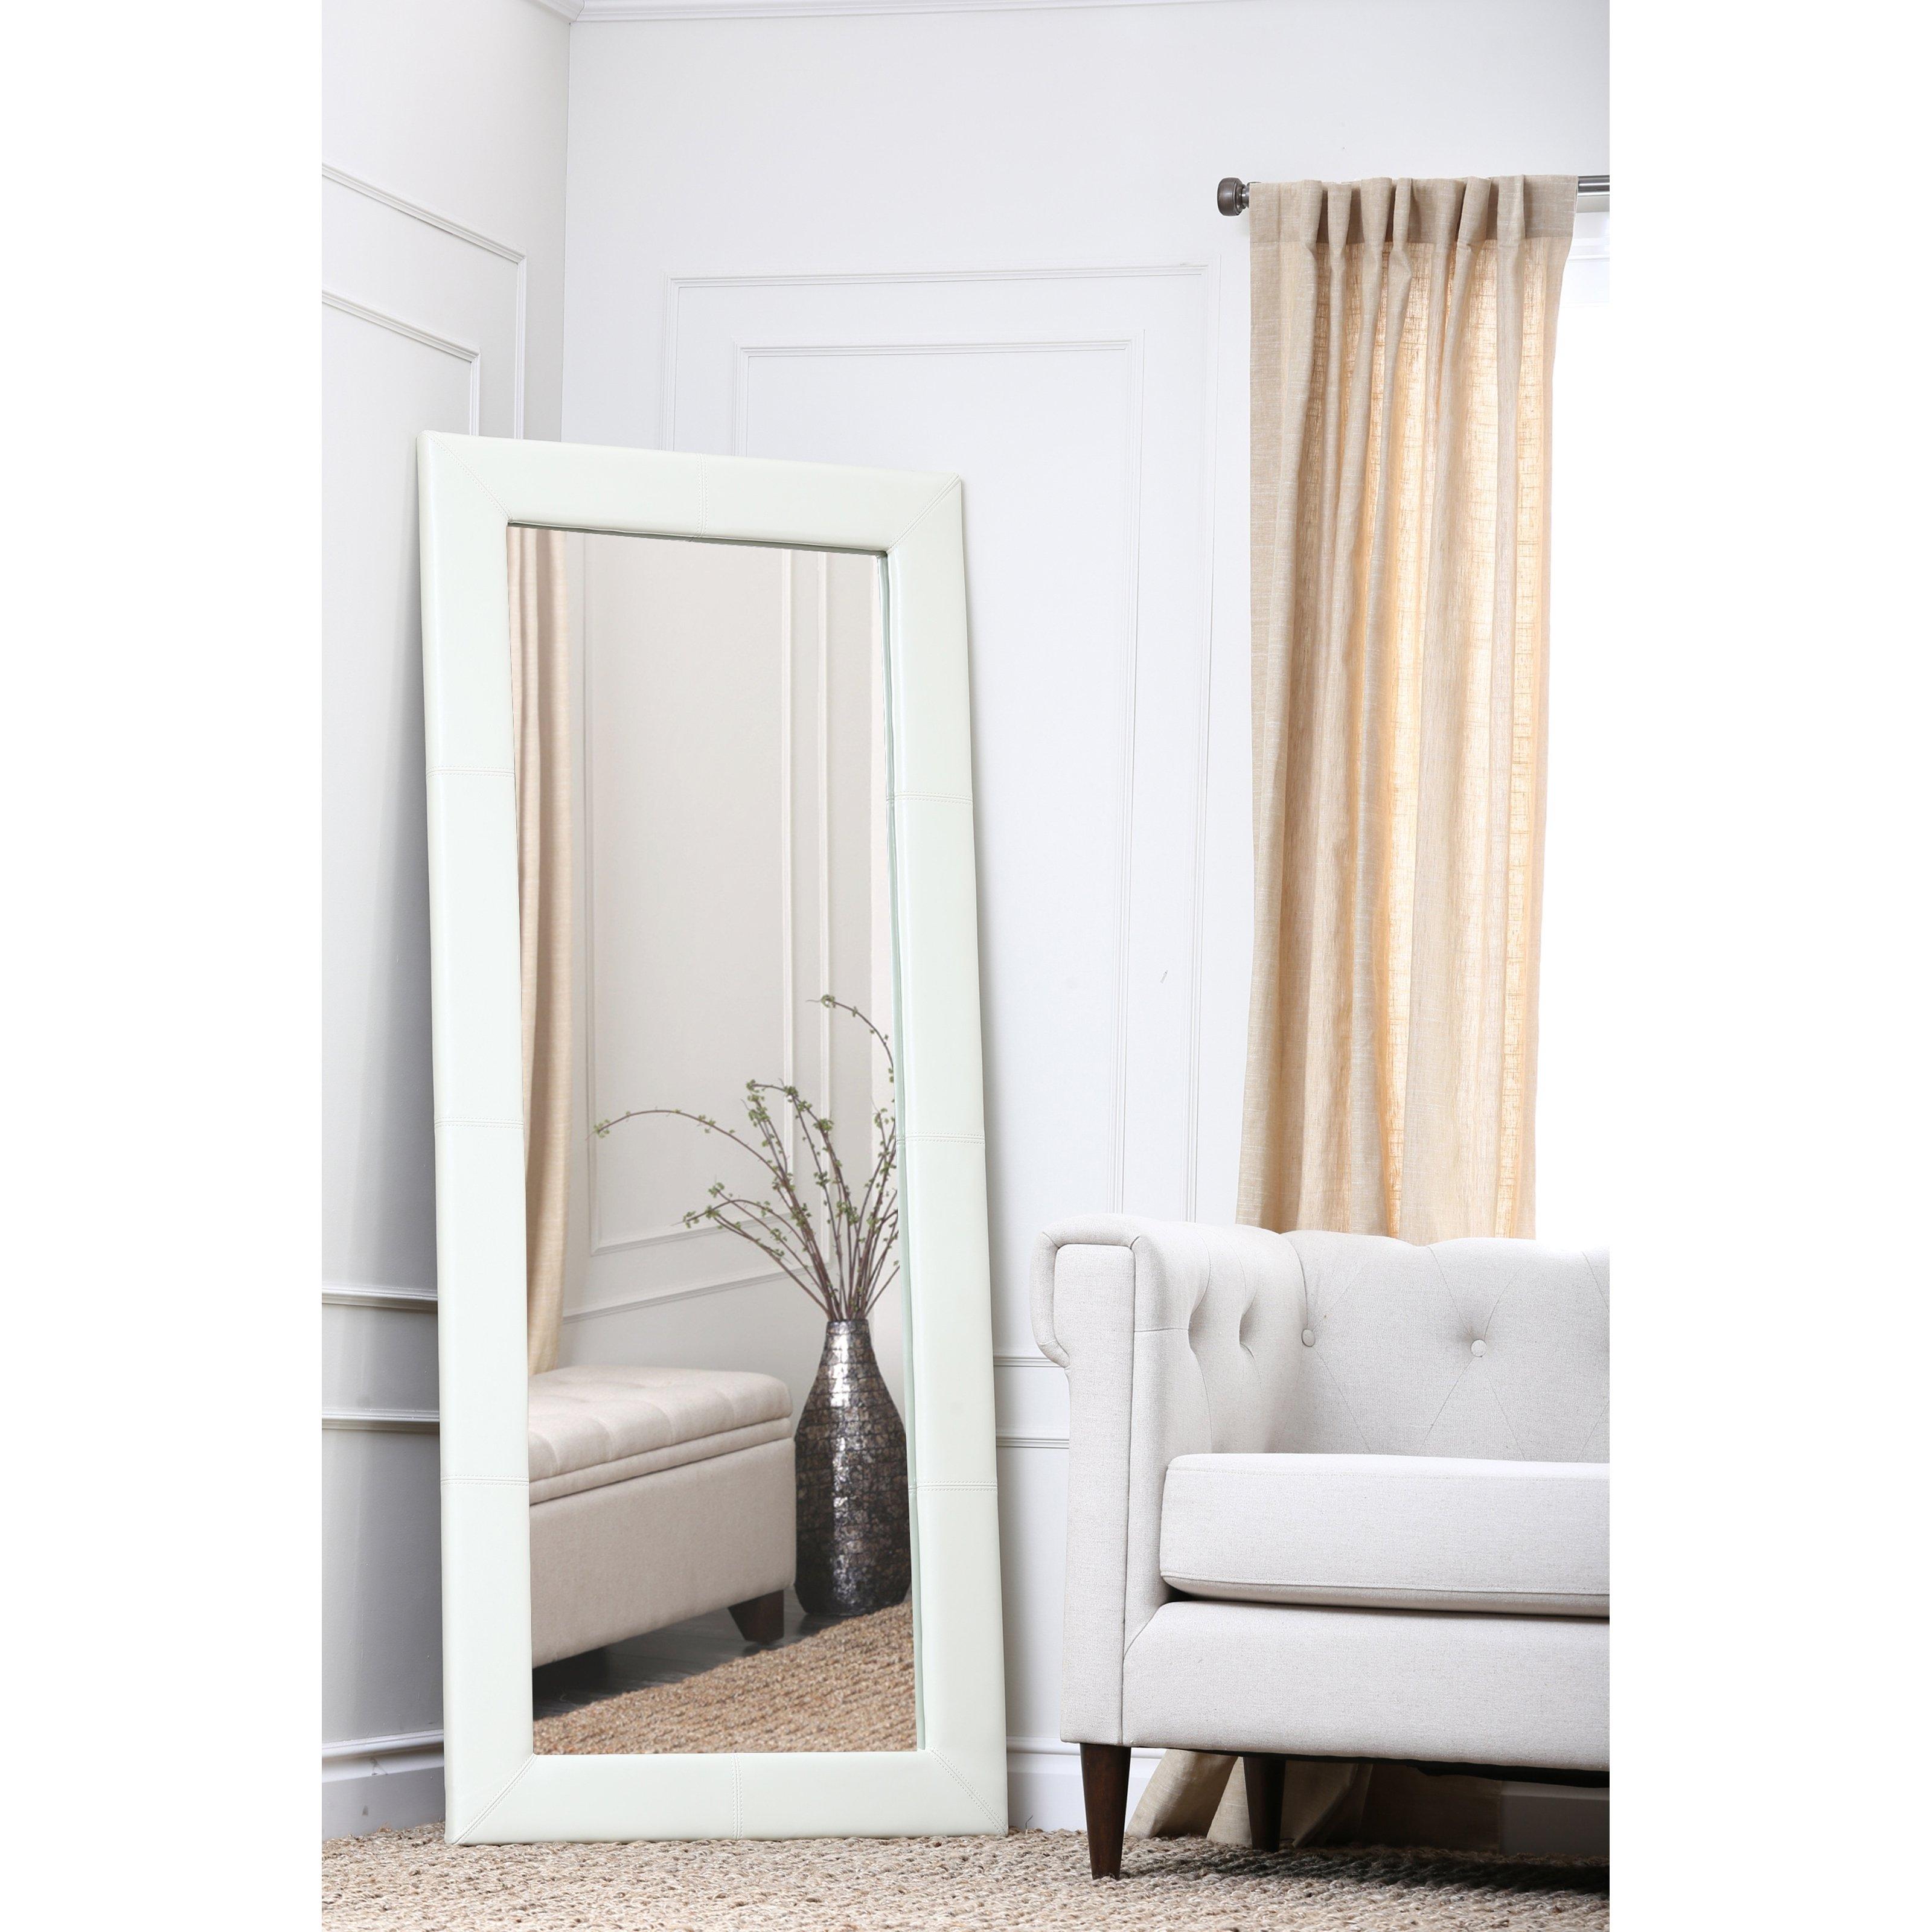 15 Large White Floor Mirror Mirror Ideas